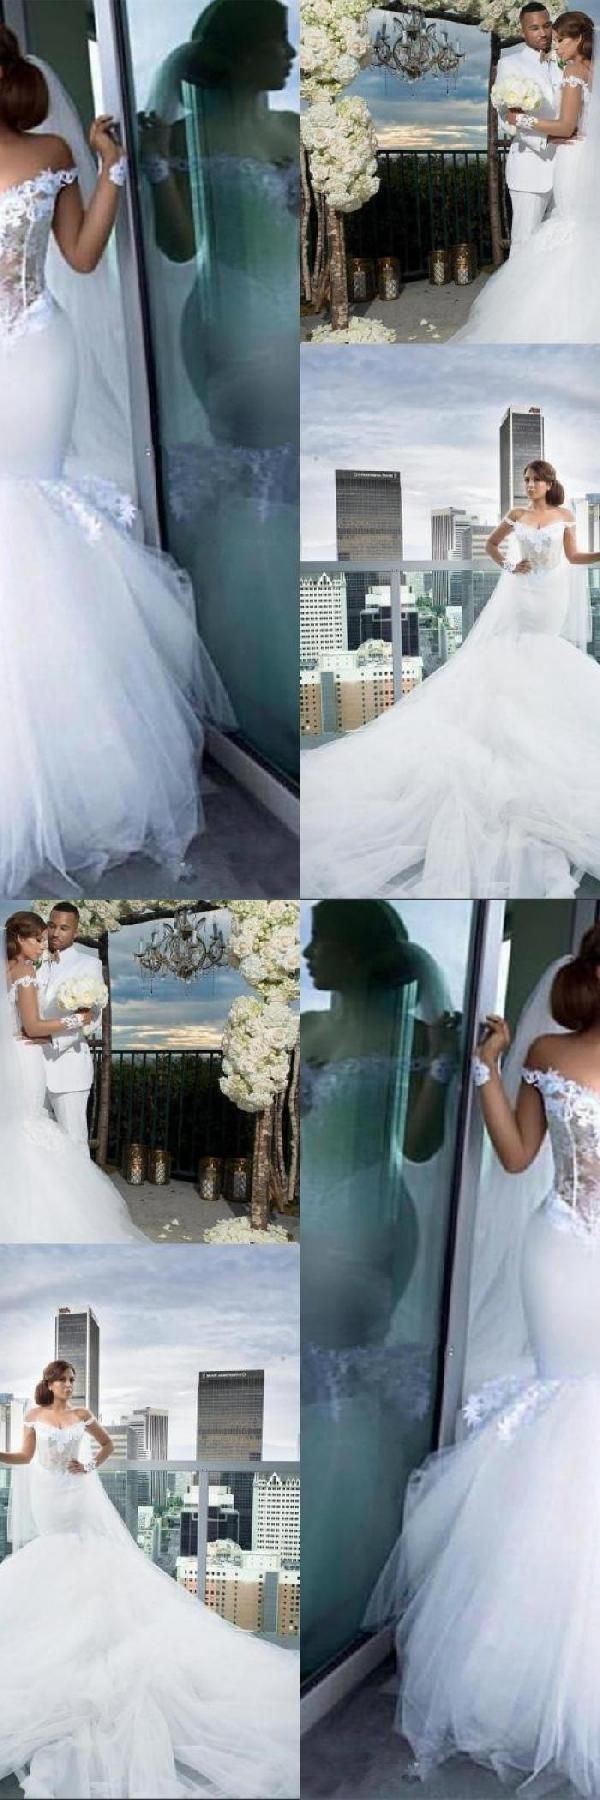 Cheap soft mermaid wedding dresses mermaid tulle elegant appliques